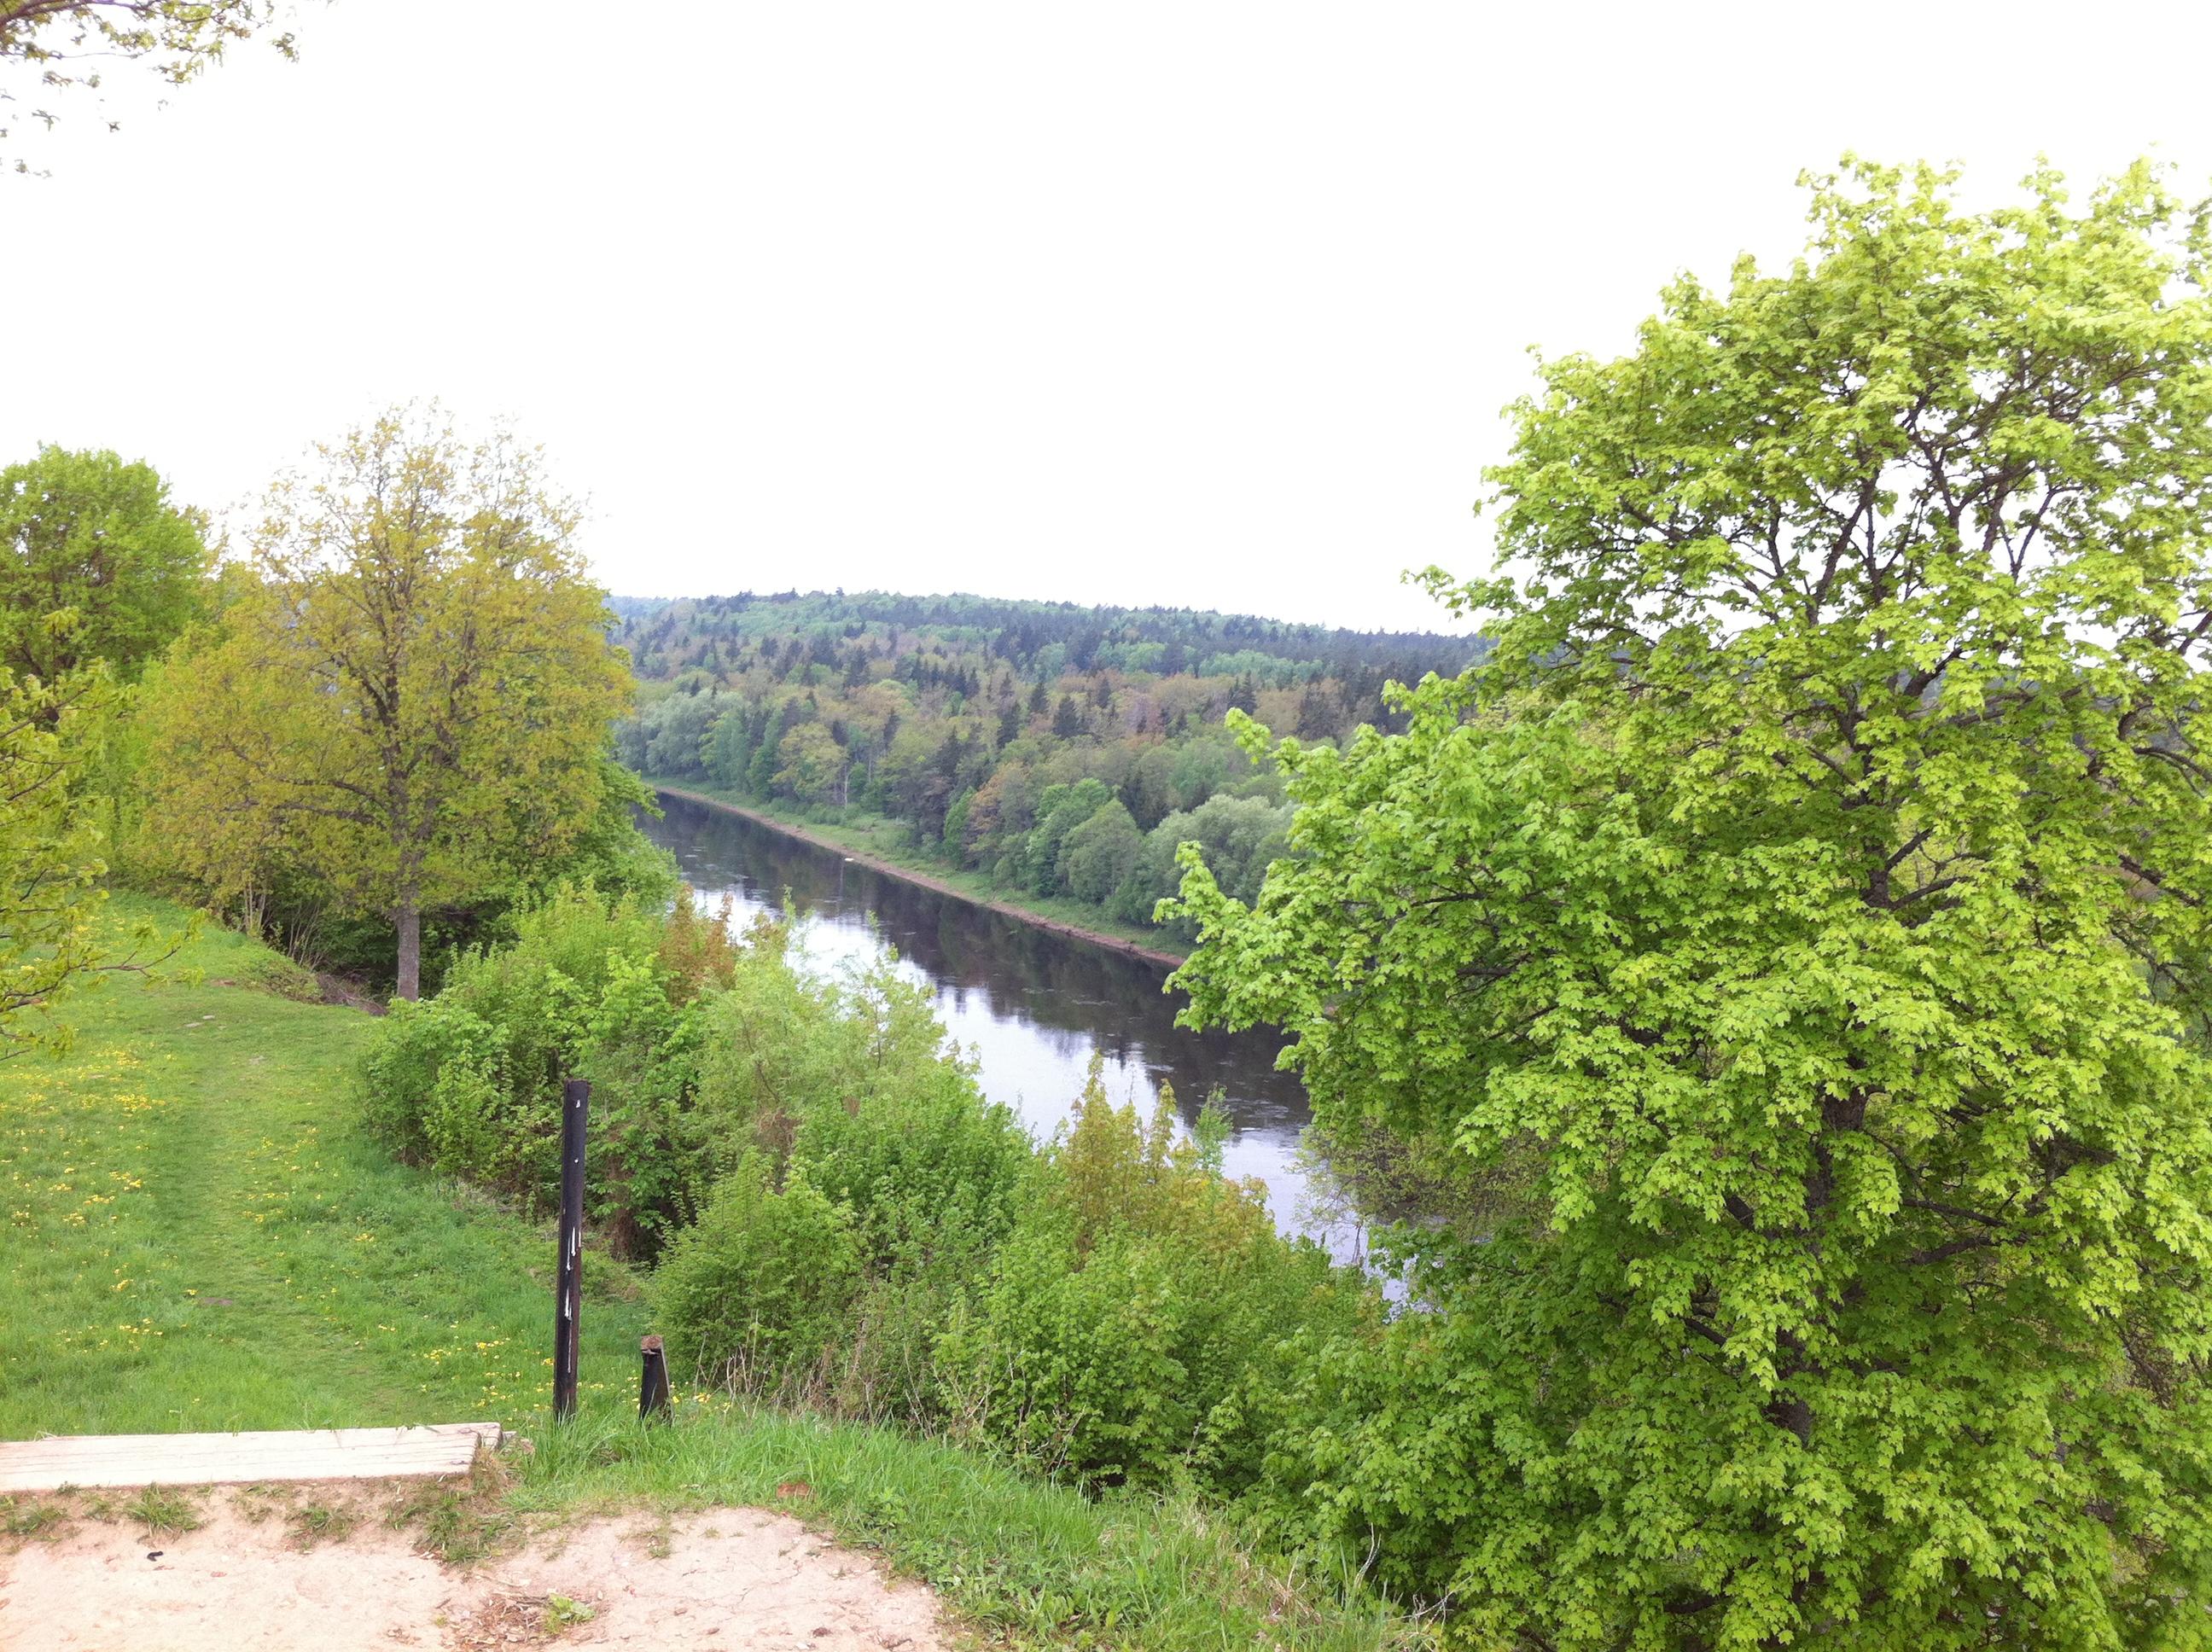 keliones Lietuvoje pramogos dzukija merkine (5)